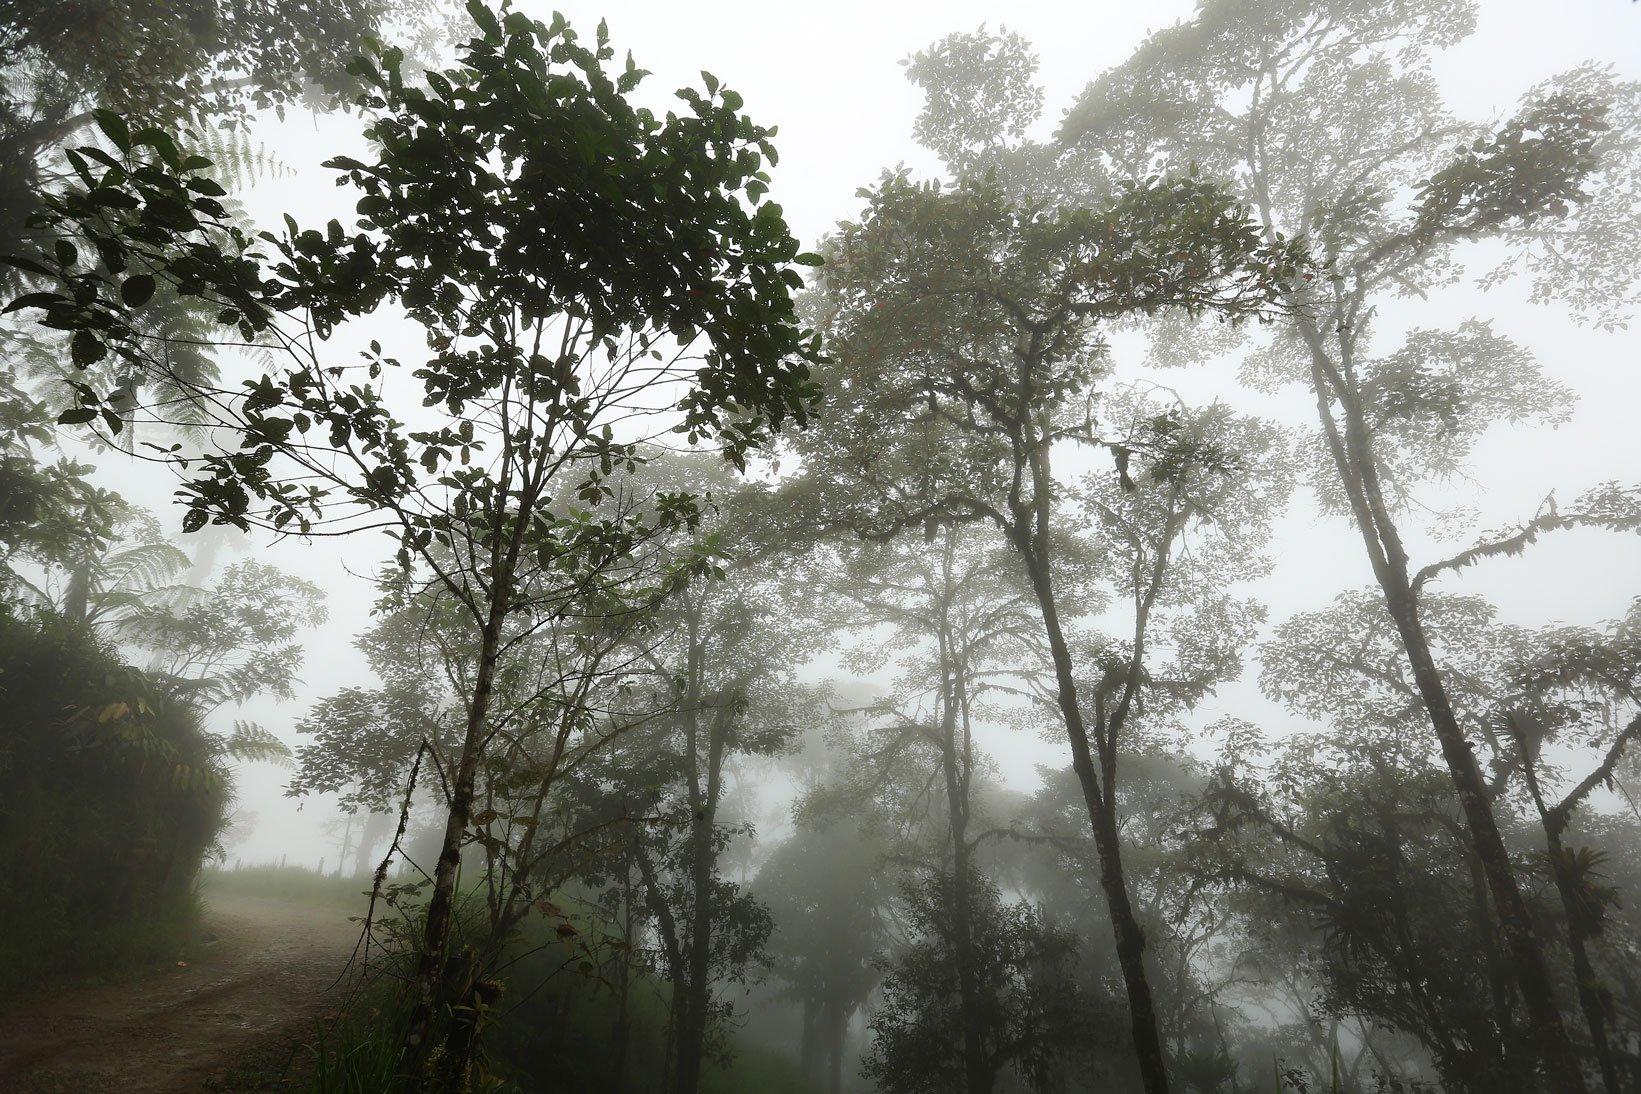 Mysterious cloud forest in Ecuador - Ecuador travel